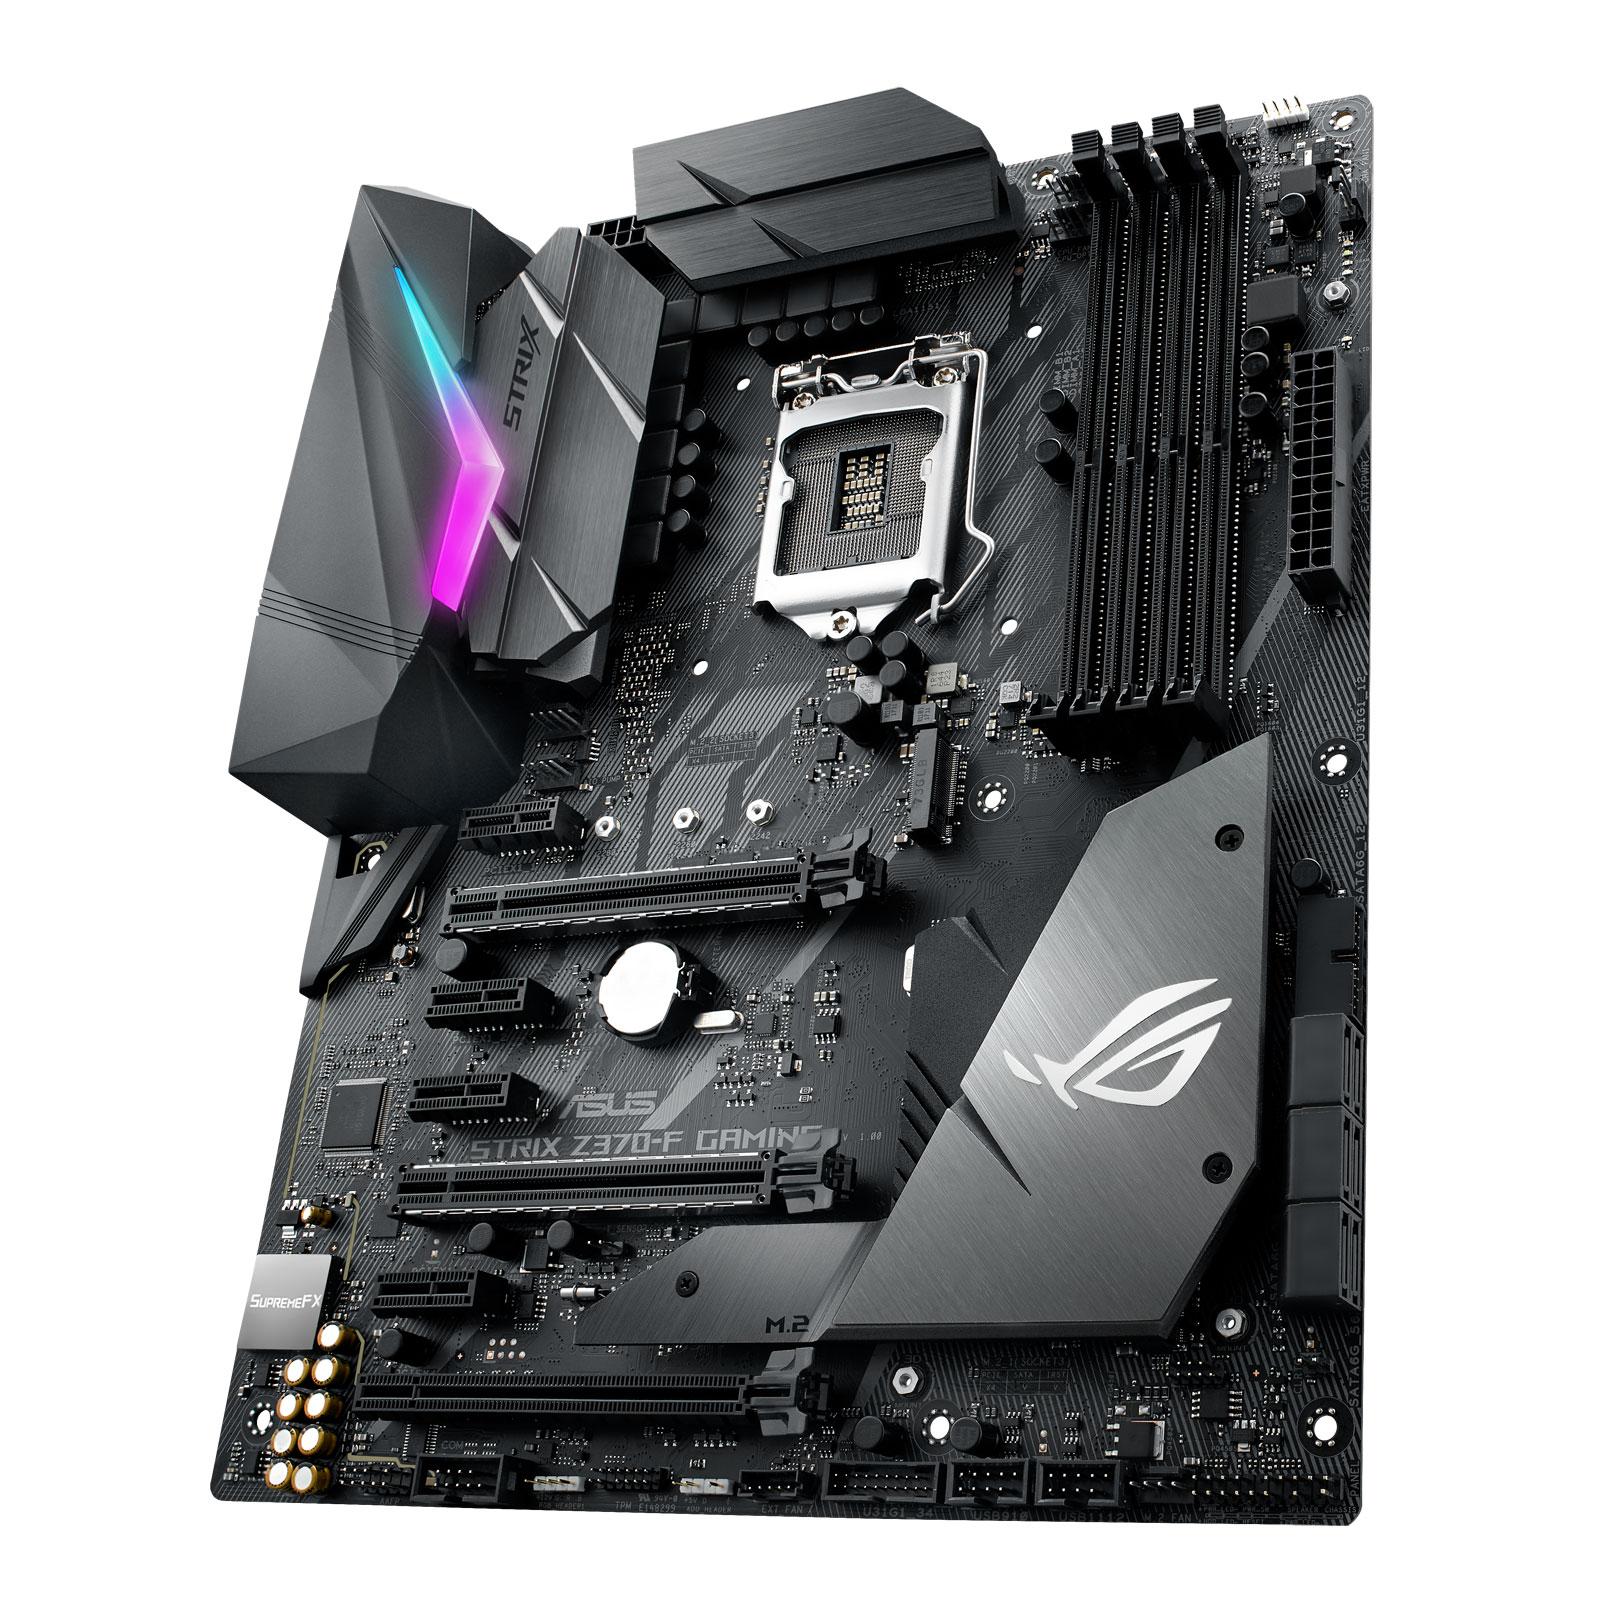 Asus STRIX Z370-F Gaming ATX DDR4 - Carte mère Asus - Cybertek.fr - 2